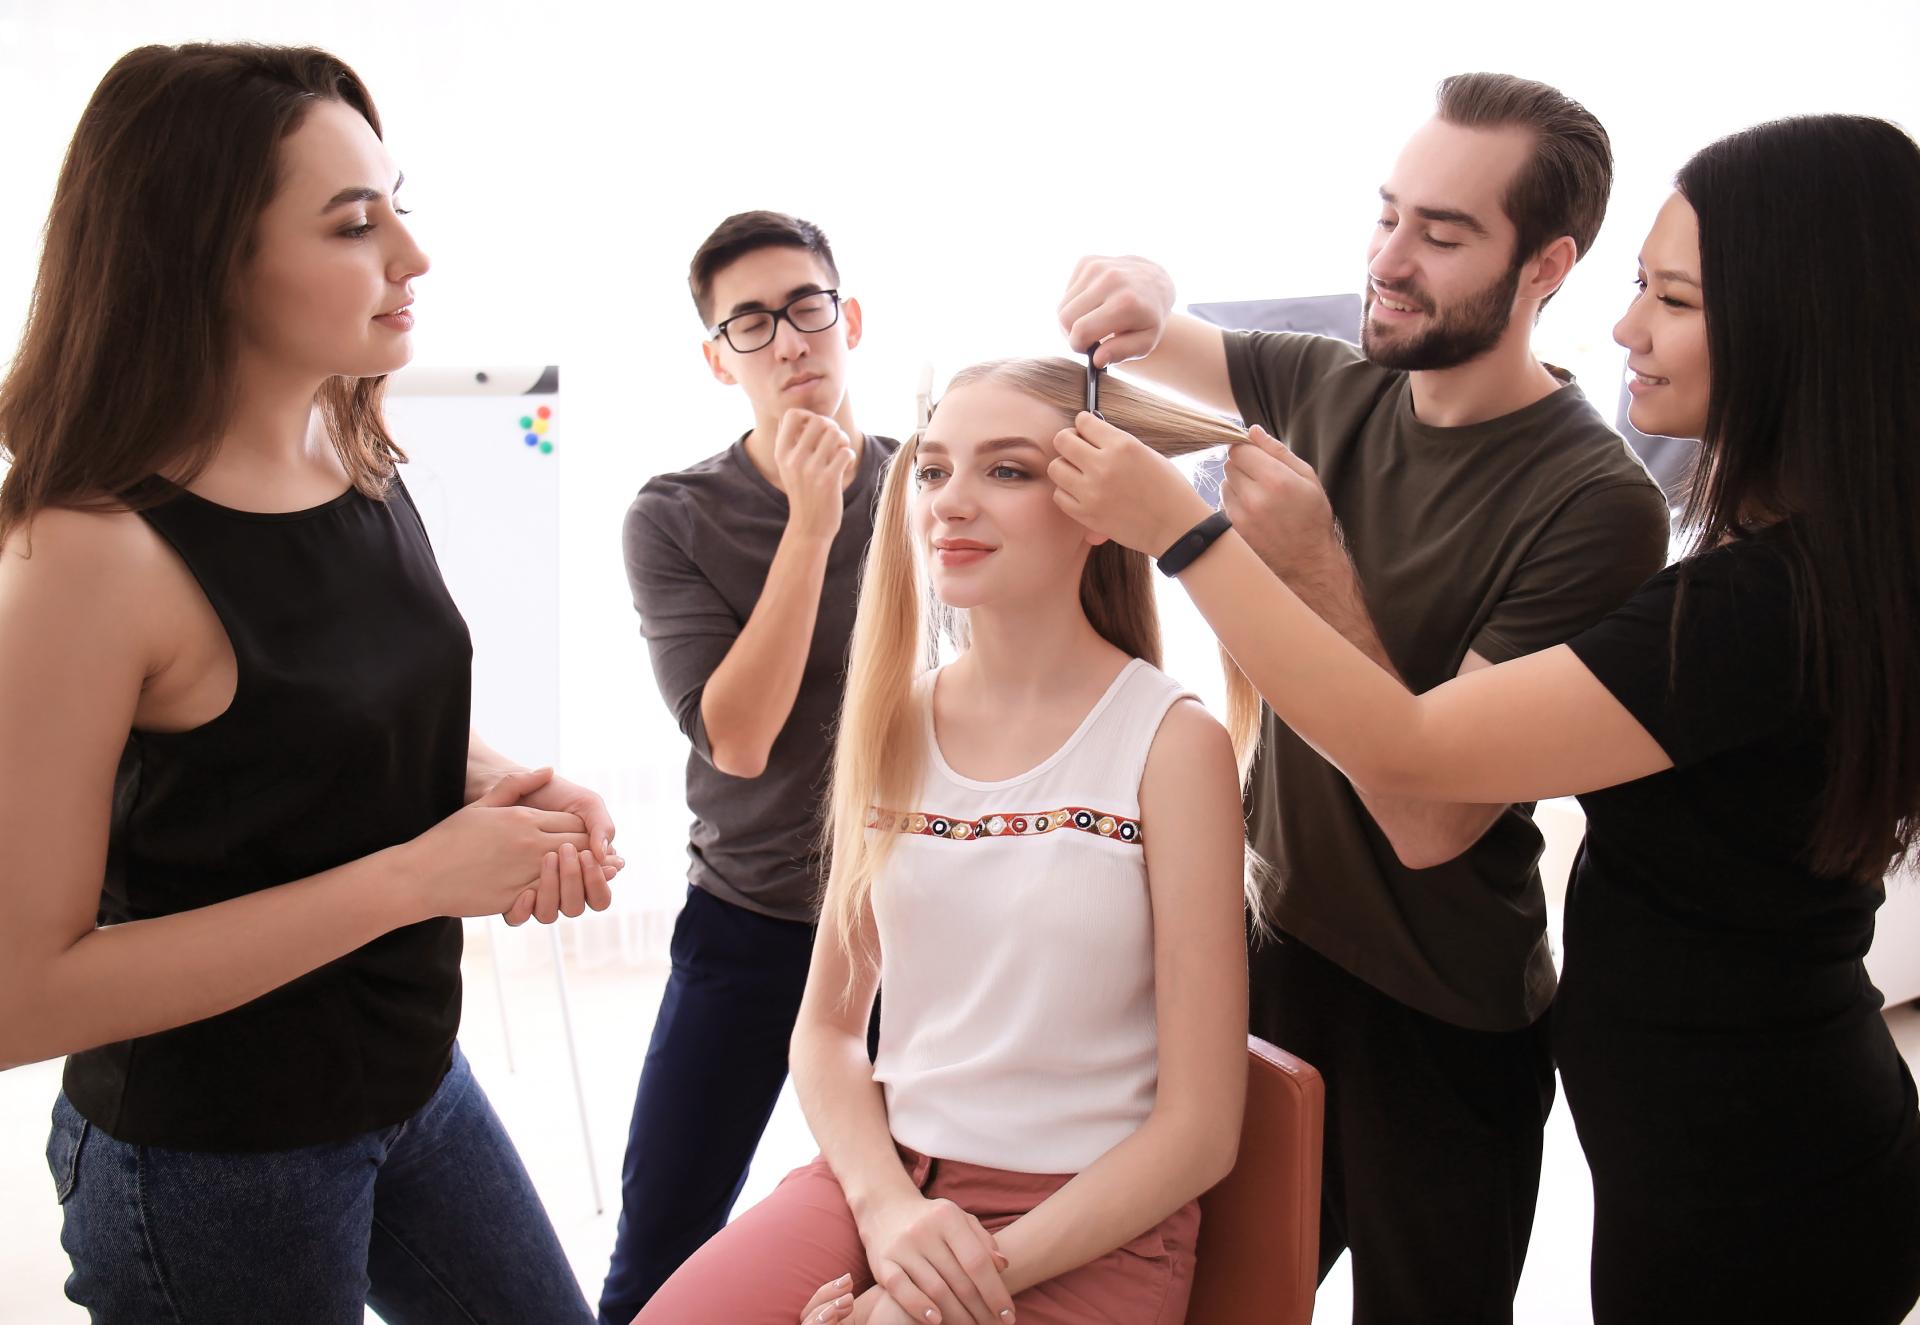 4 Tips for Preparing for Beauty School